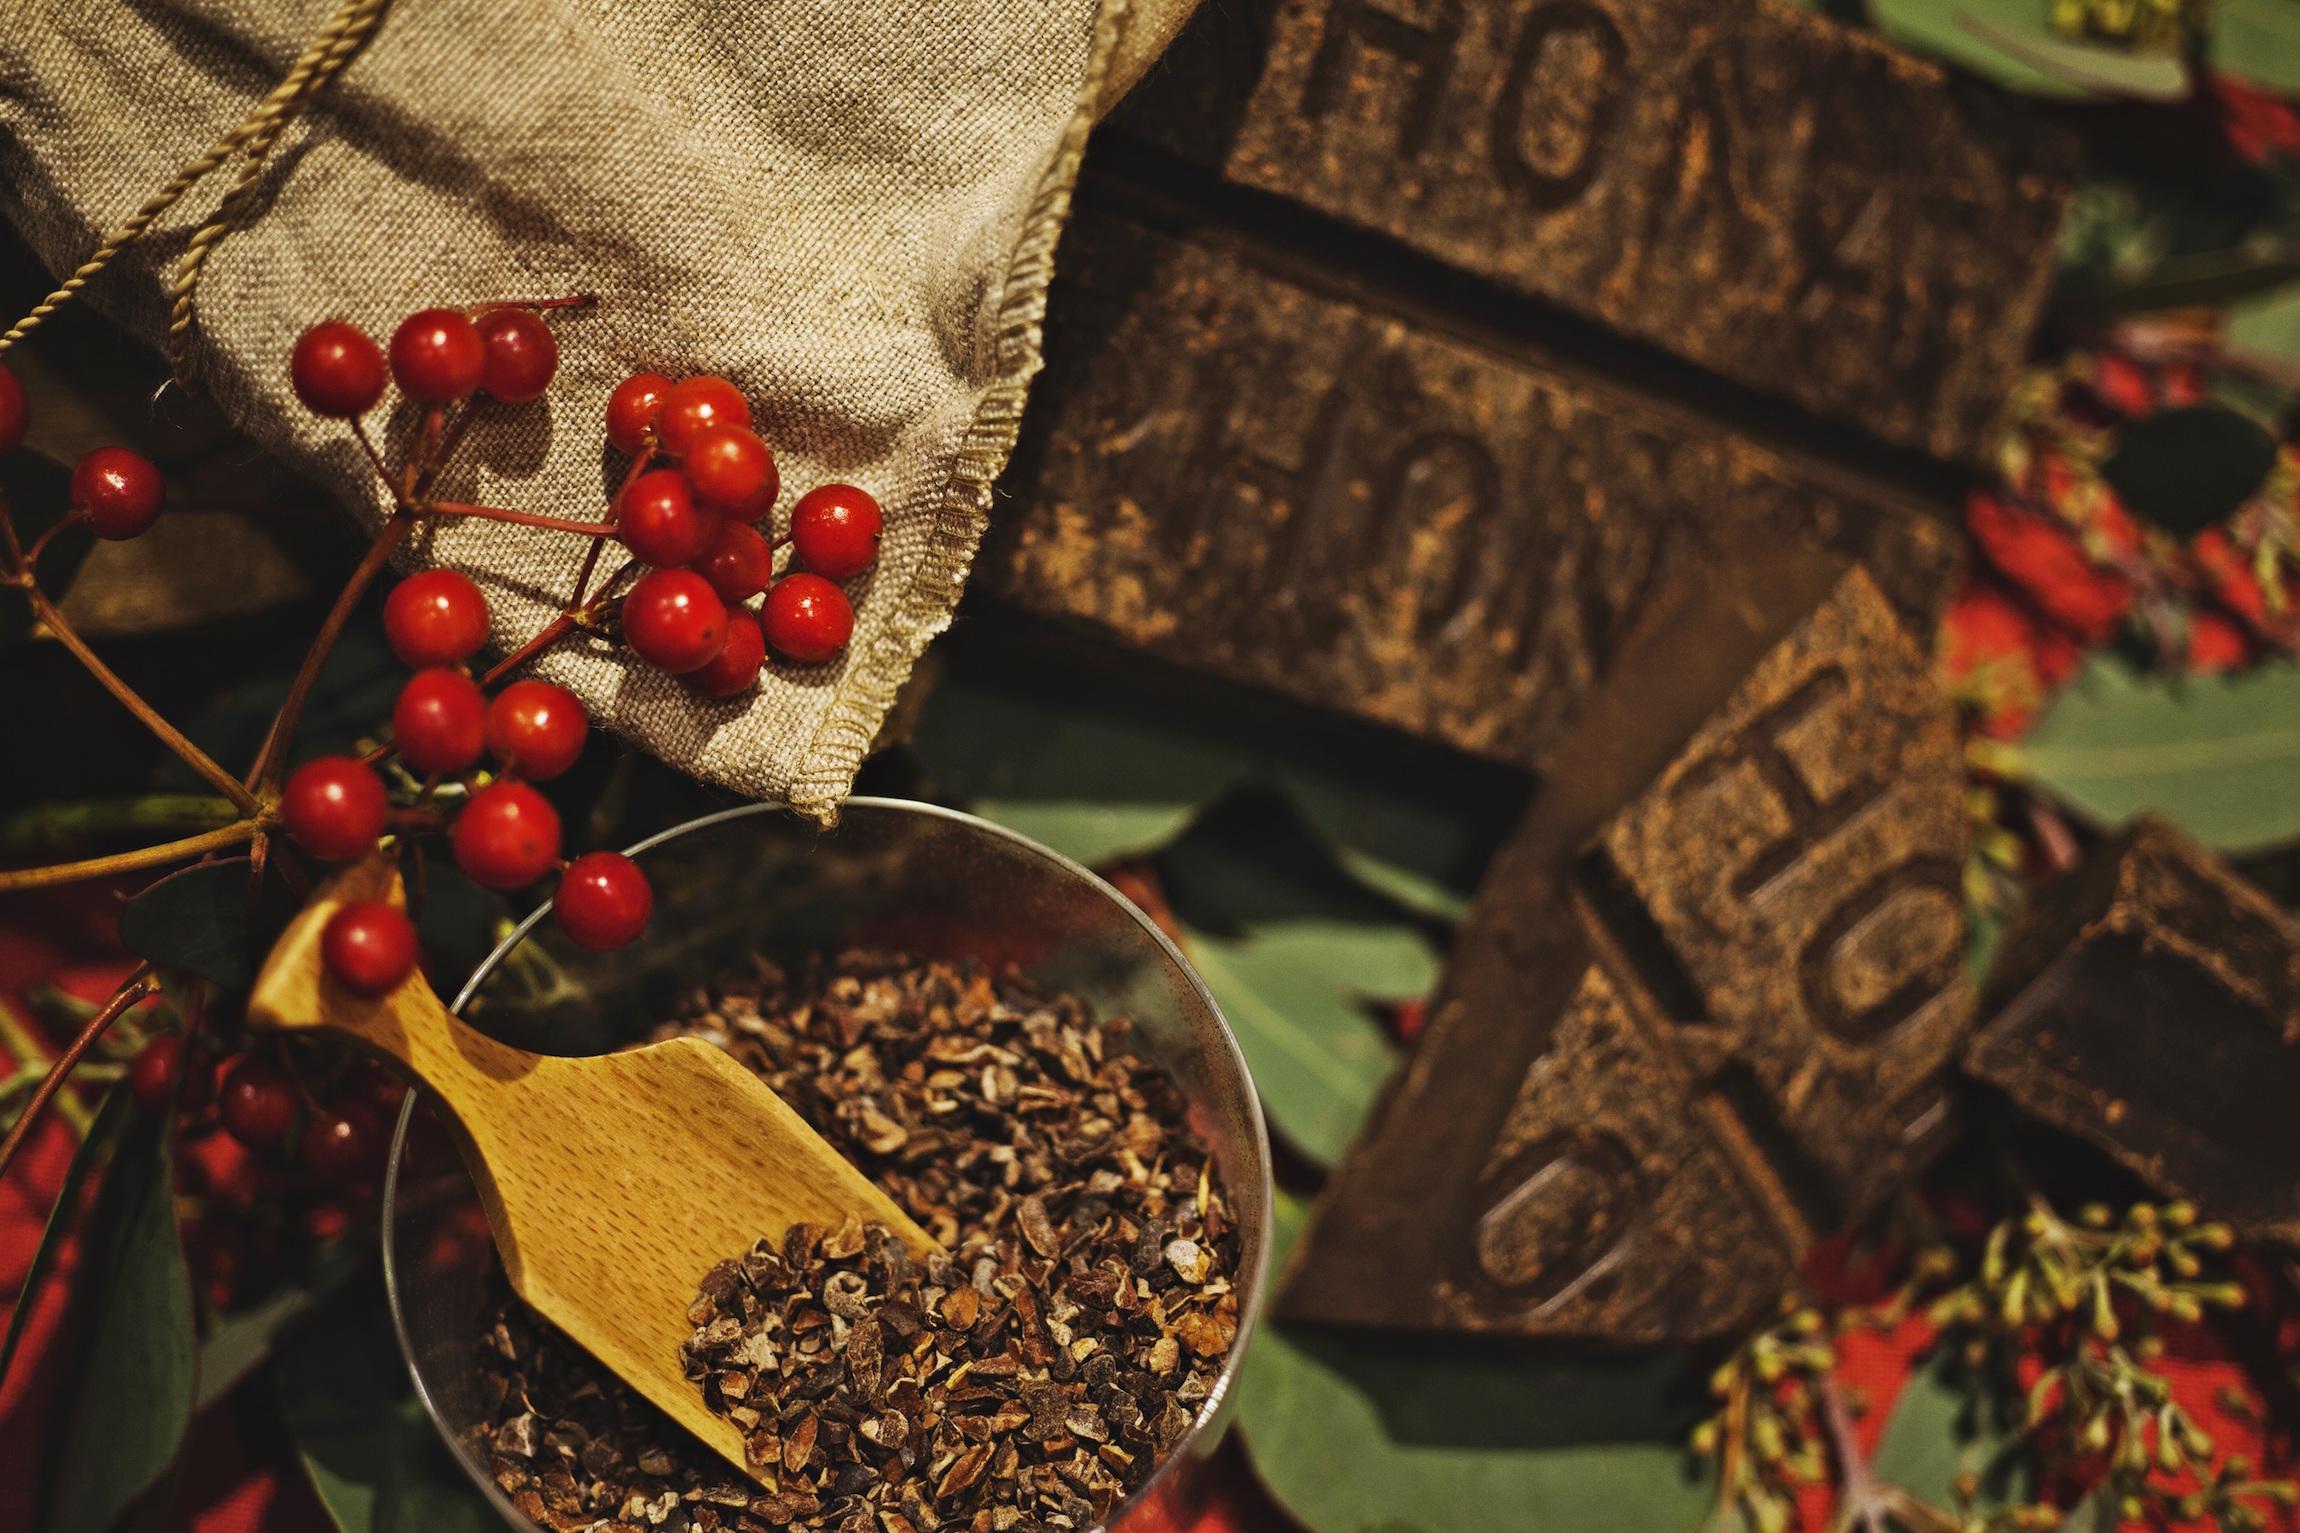 andaztokyo-aospa-2016christmas-cacao-bath-1